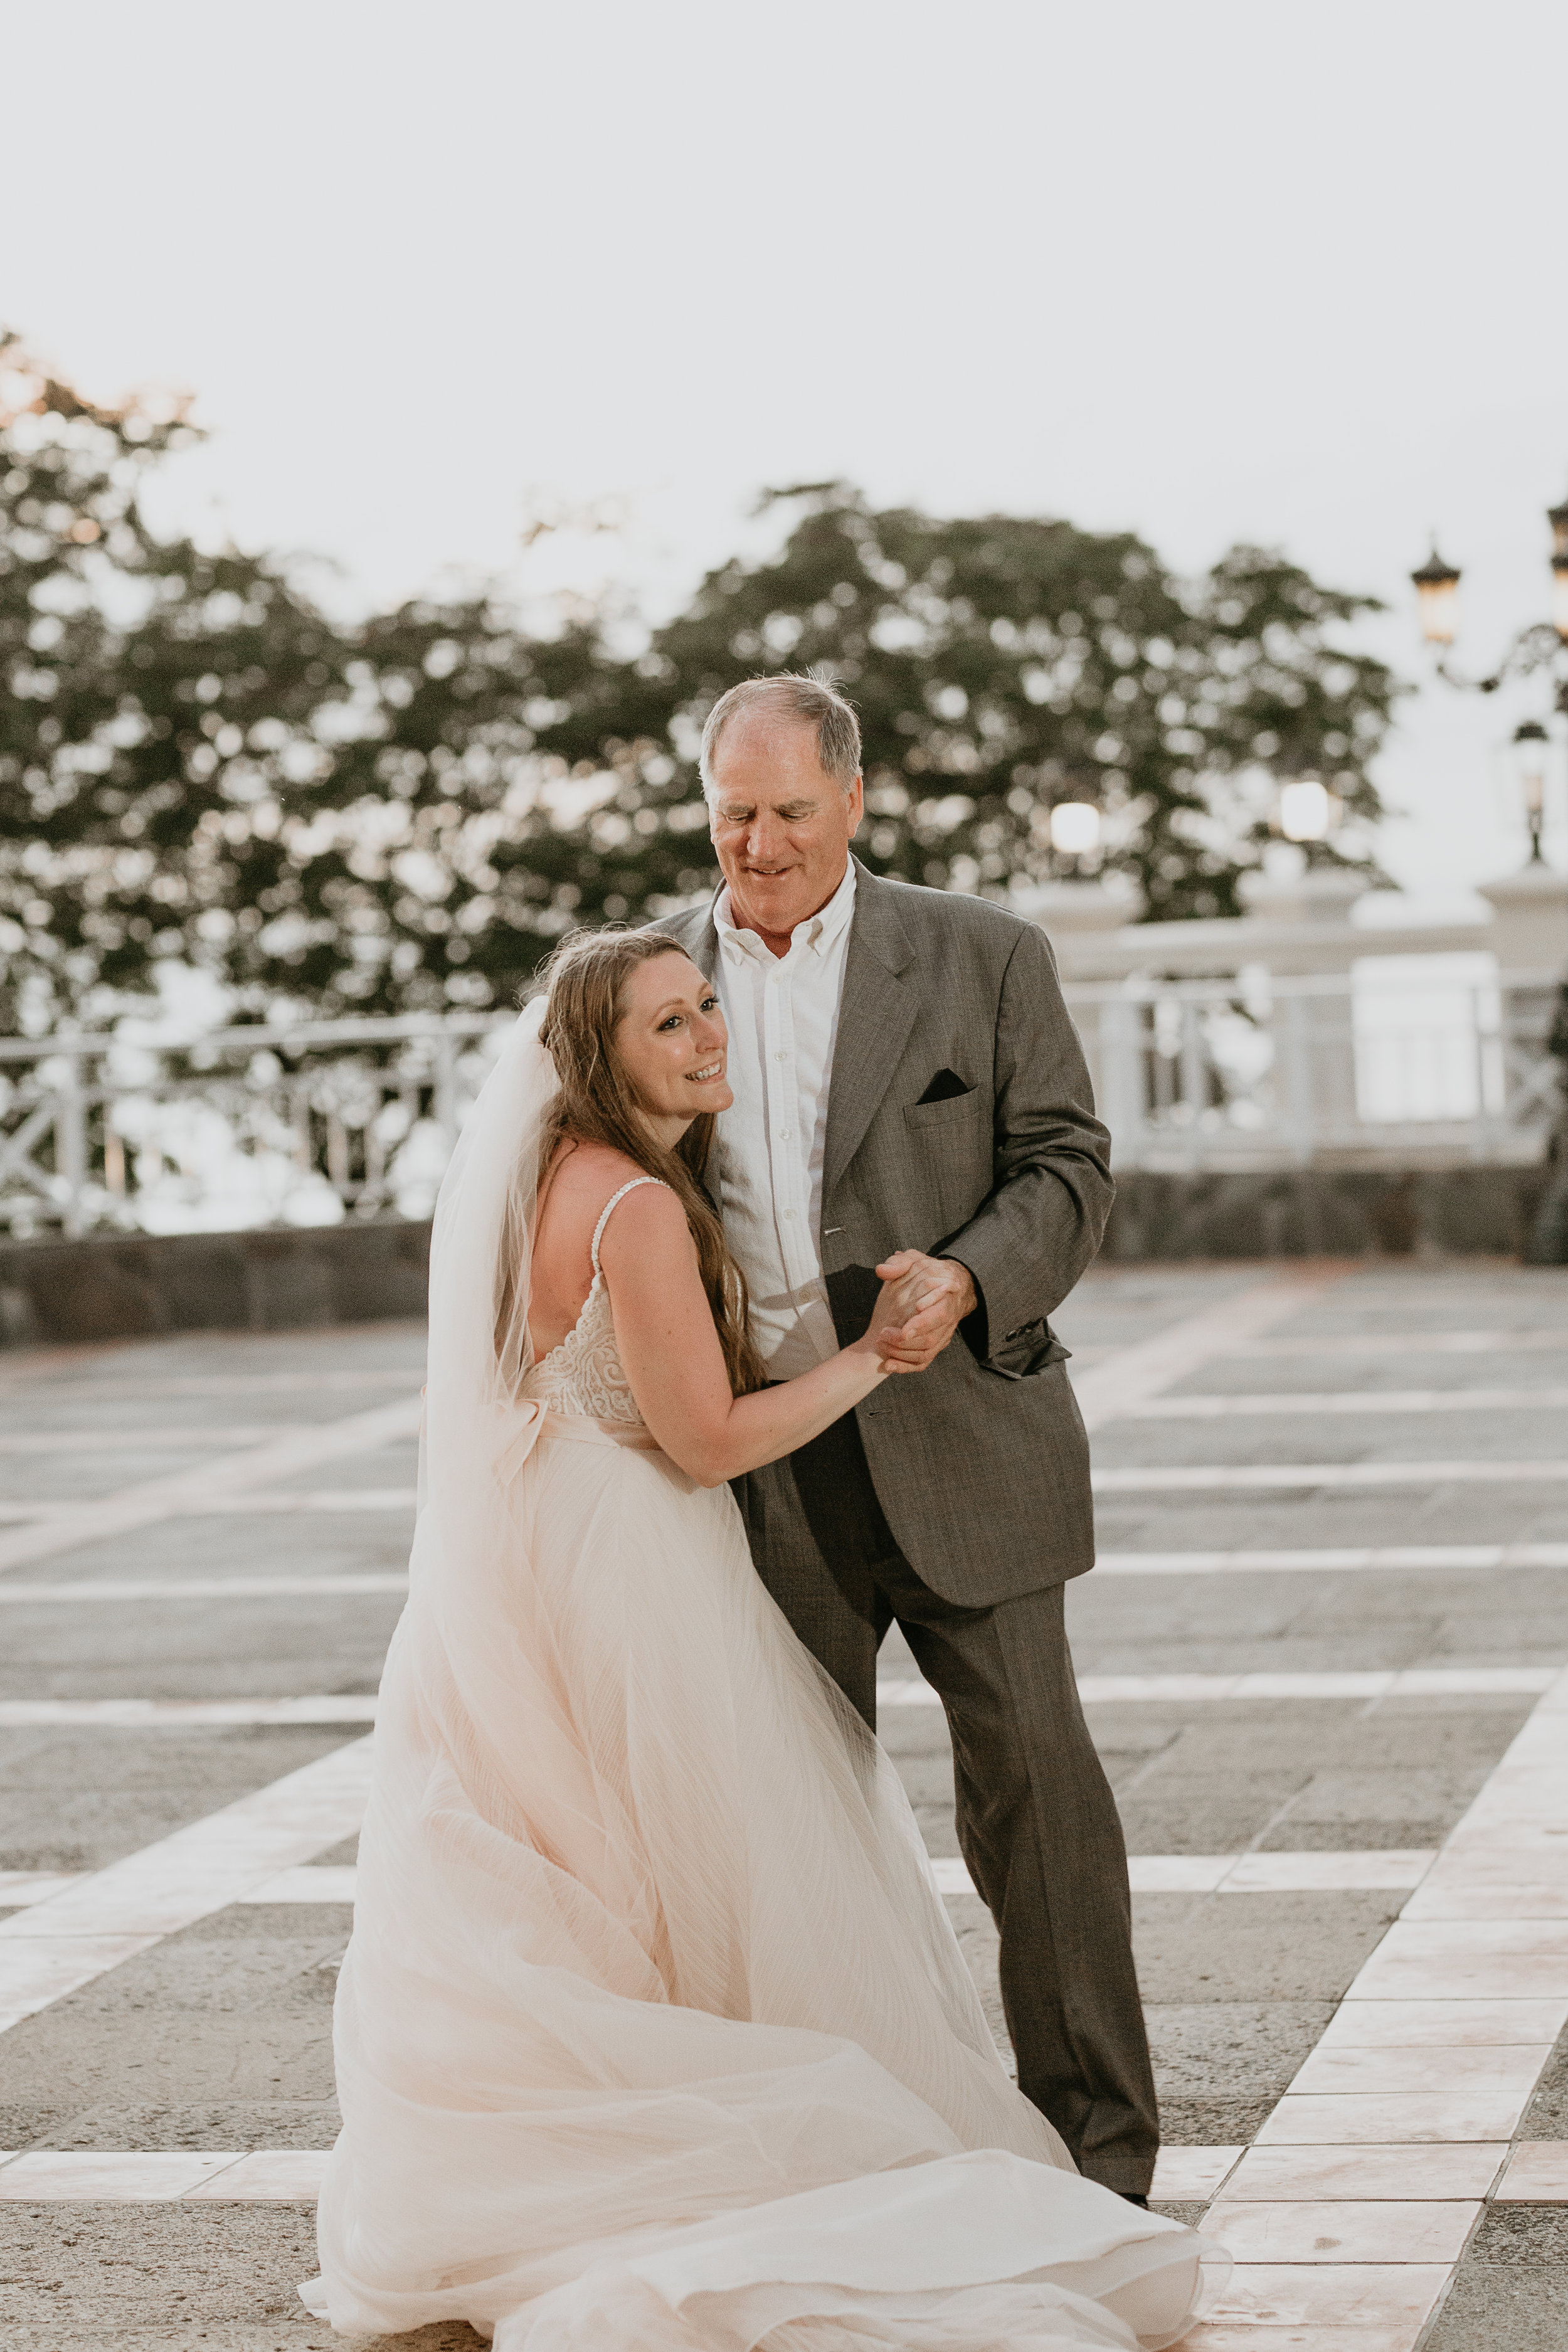 nicole-daacke-photography-destination-wedding-in-st-lucia-sandals-la-toc-intimate-island-wedding-carribean-elopement-photographer-chill-island-wedding-140.jpg